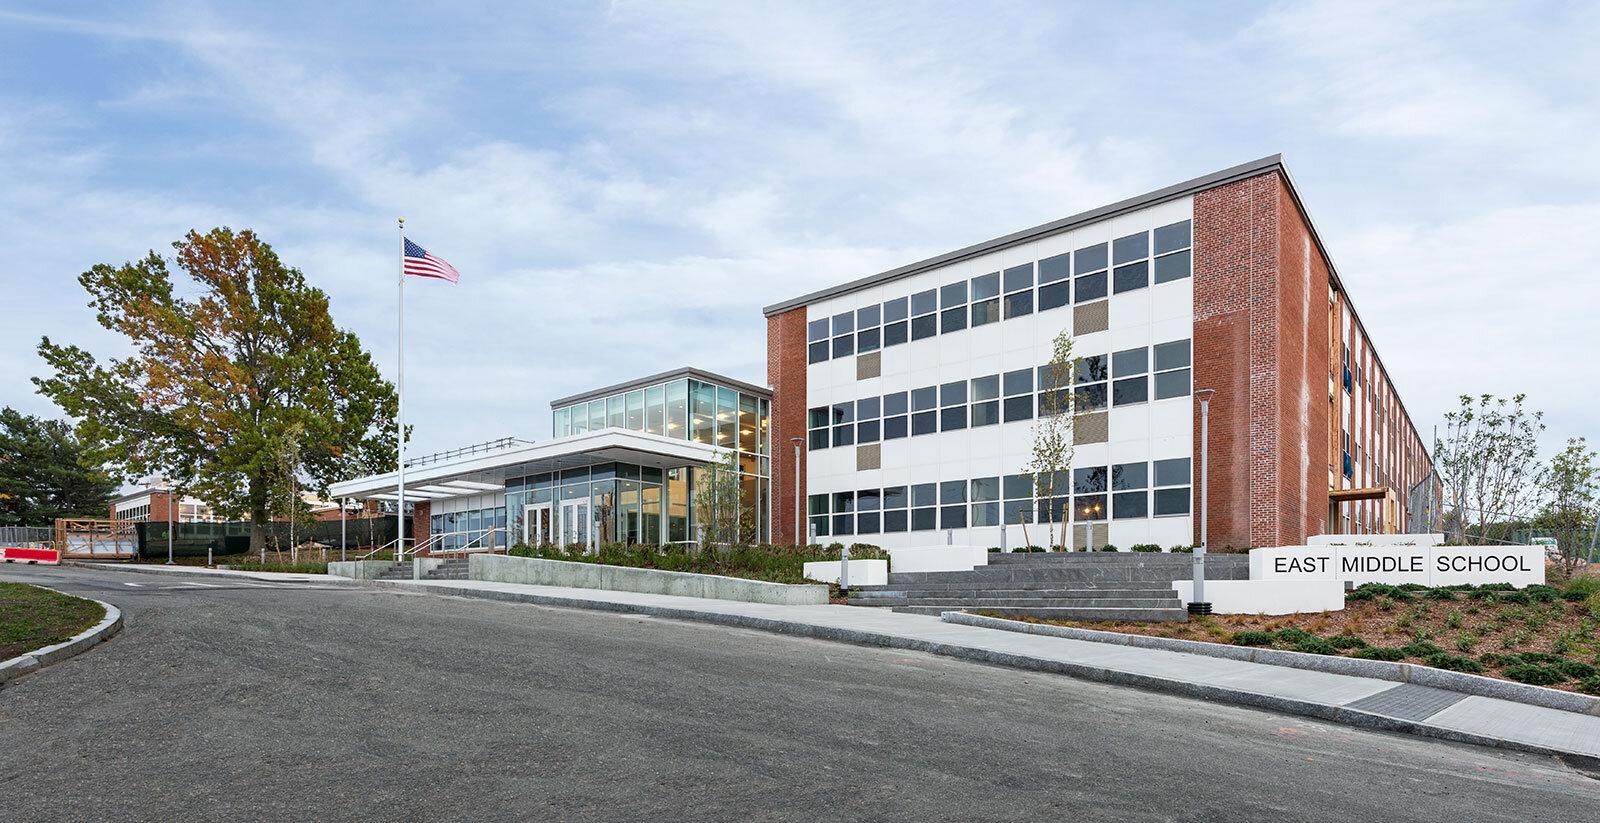 Braintree East Middle School